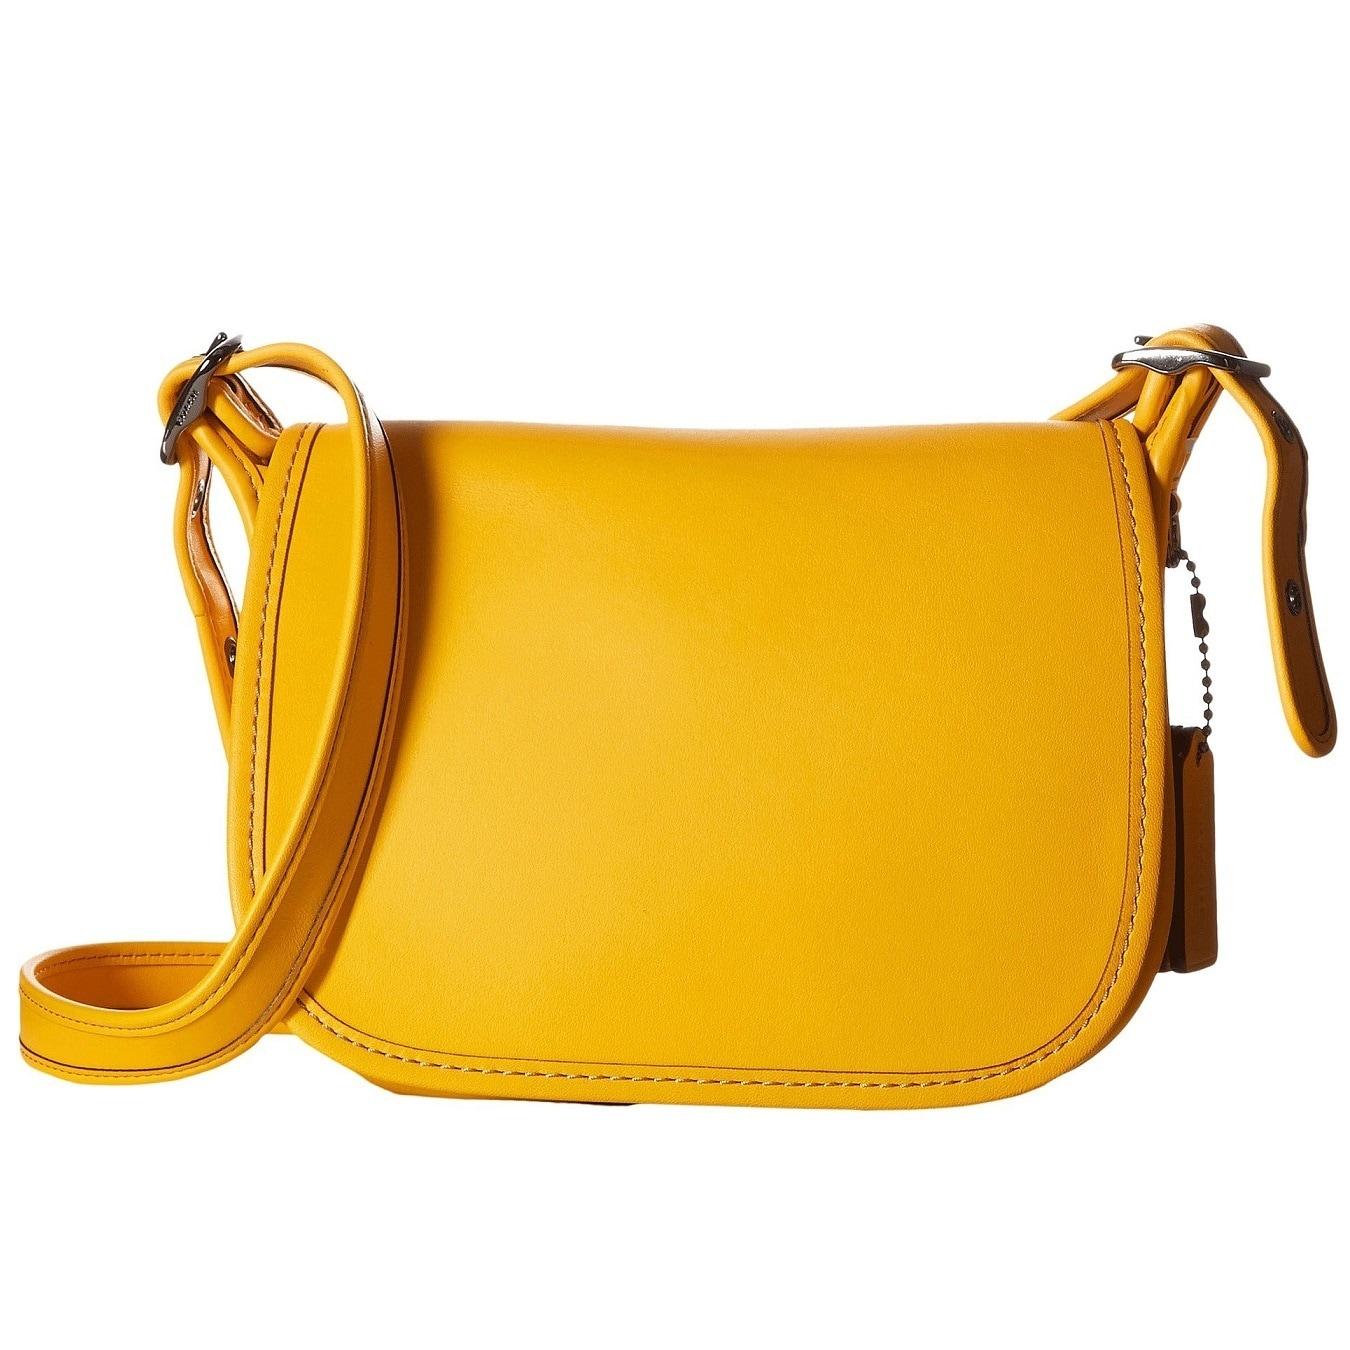 Coach Glovetanned Dark Yellow Leather Saddle Handbag Free Shipping Today 24961603